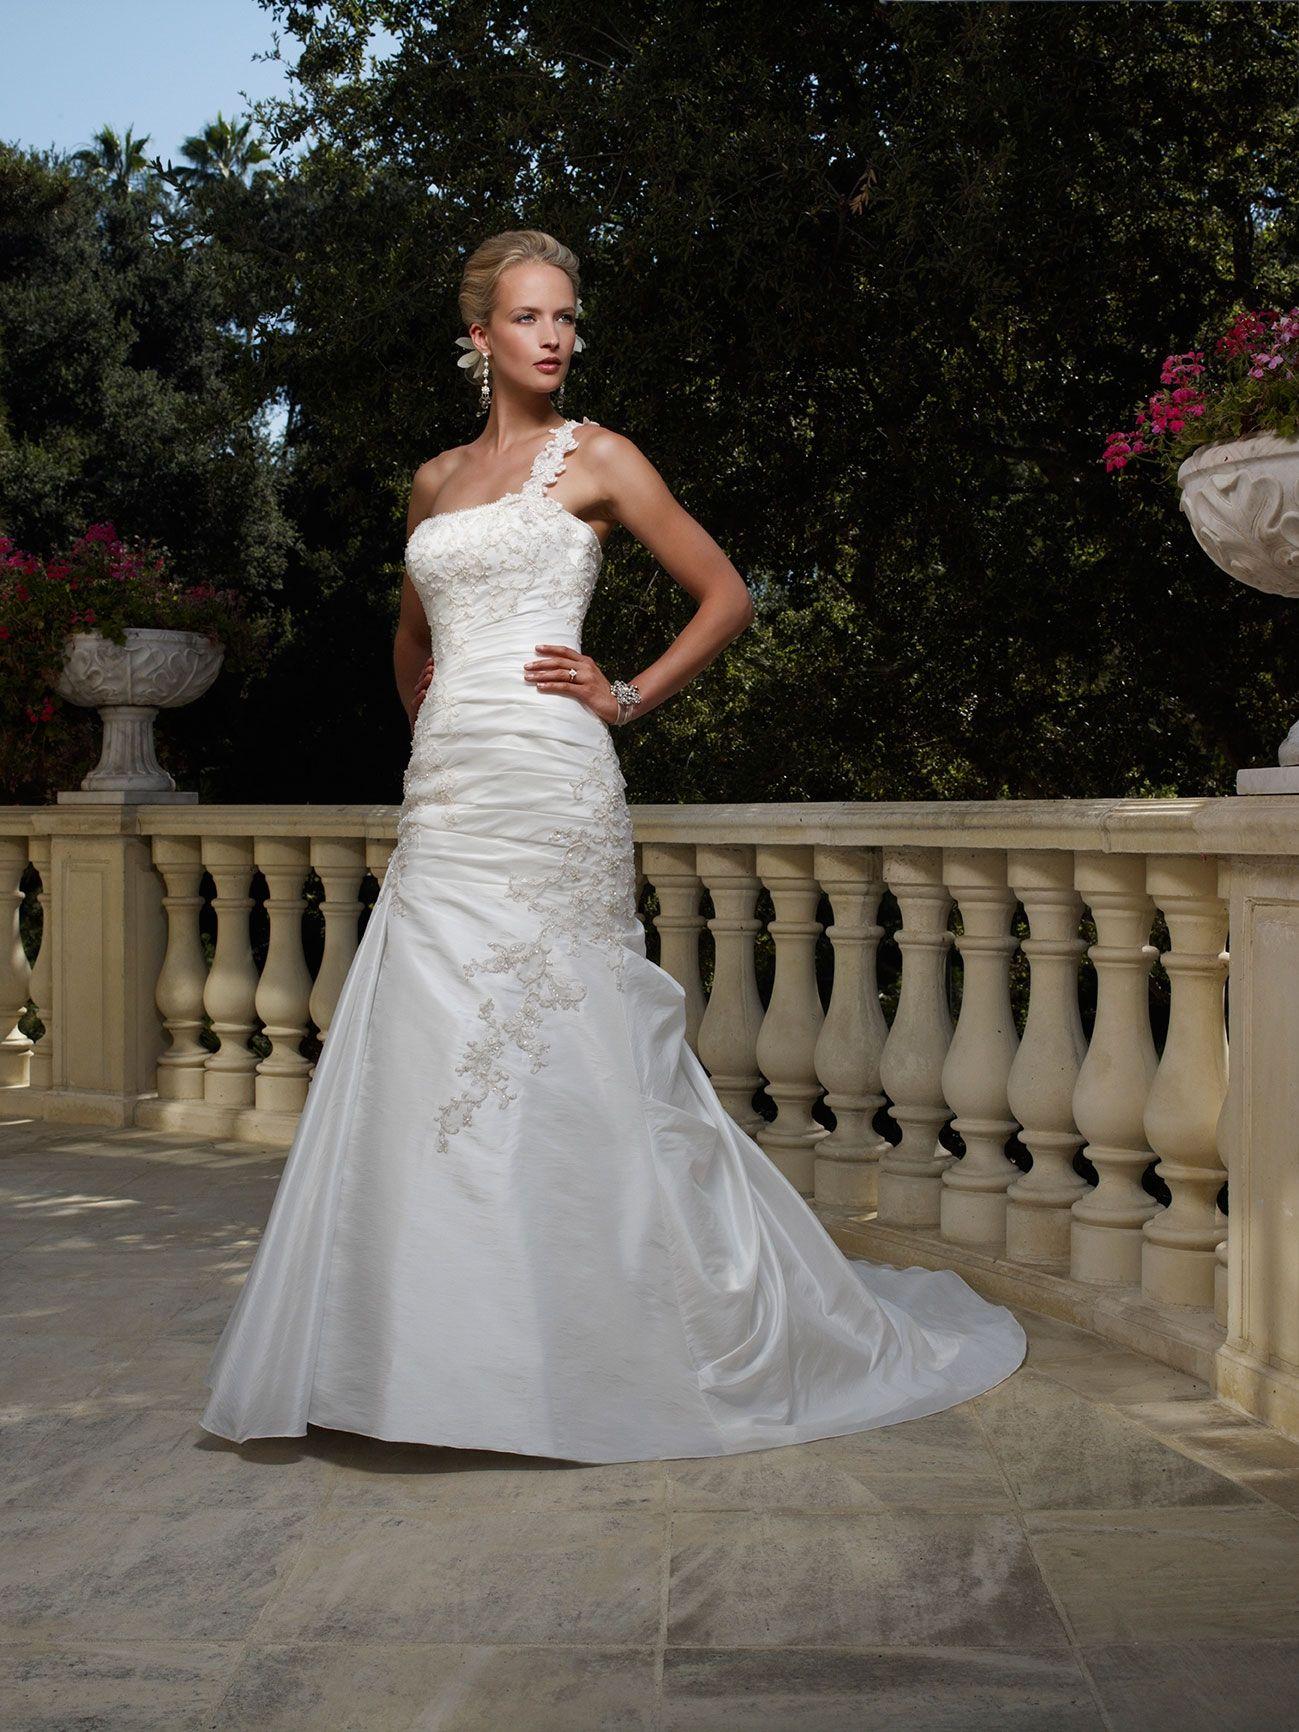 Style 1984 Traditional wedding dresses, Wedding dresses